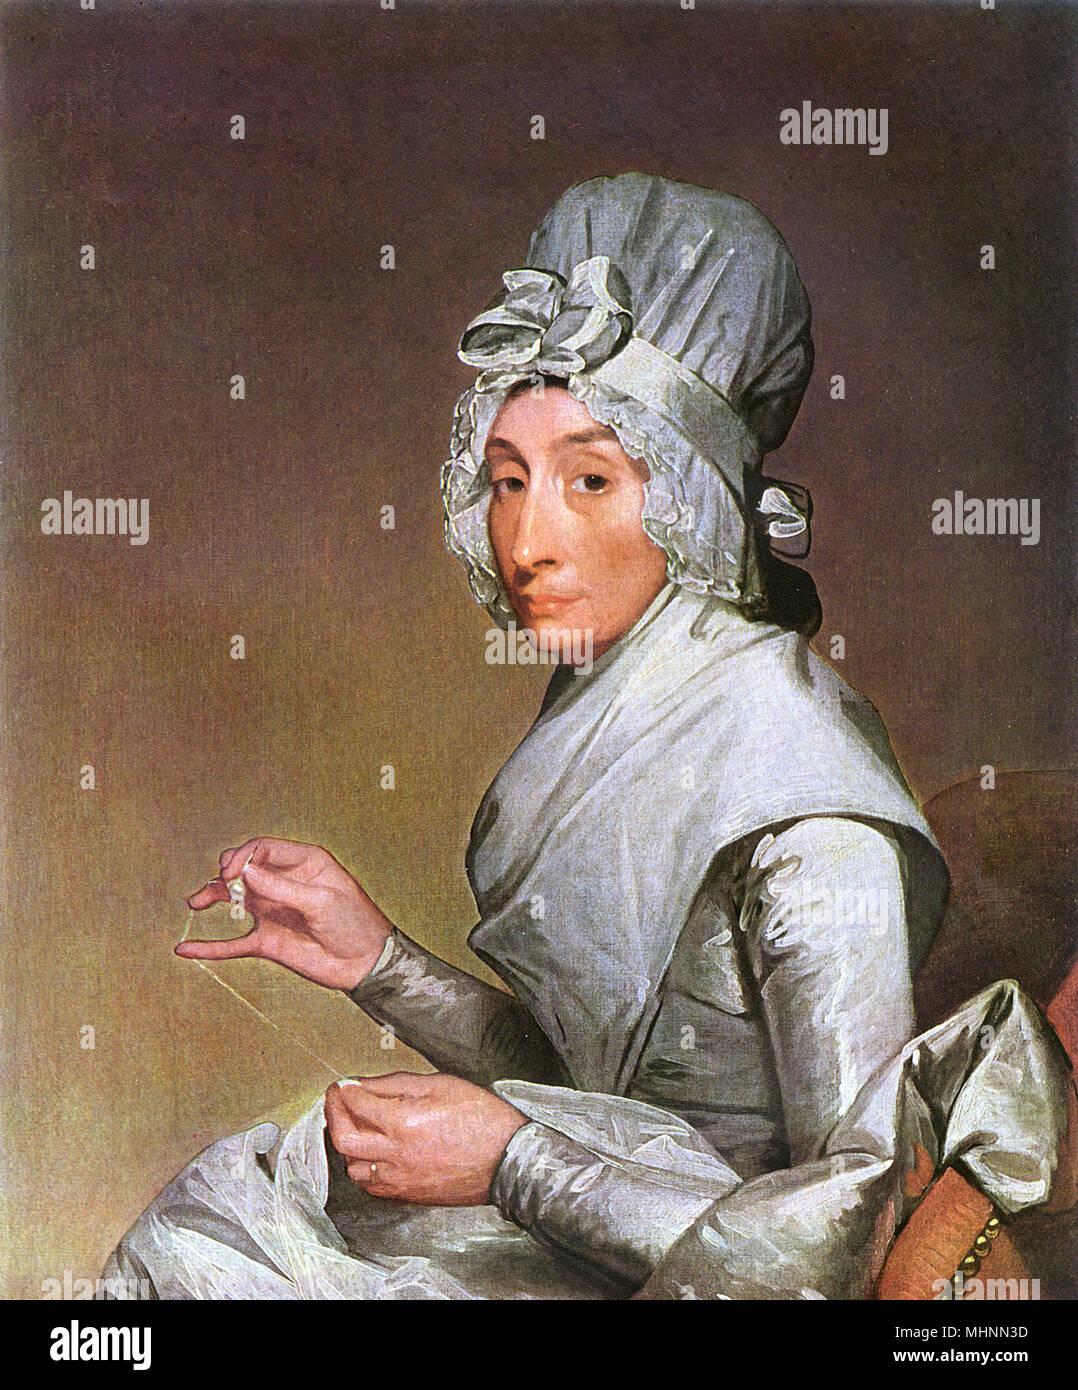 La Sra. Richard Yates de Gilbert Stuart (1755-1828) - óleo sobre lienzo. Retrato de la esposa de un comerciante de Nueva York. Fecha: 1793 Foto de stock